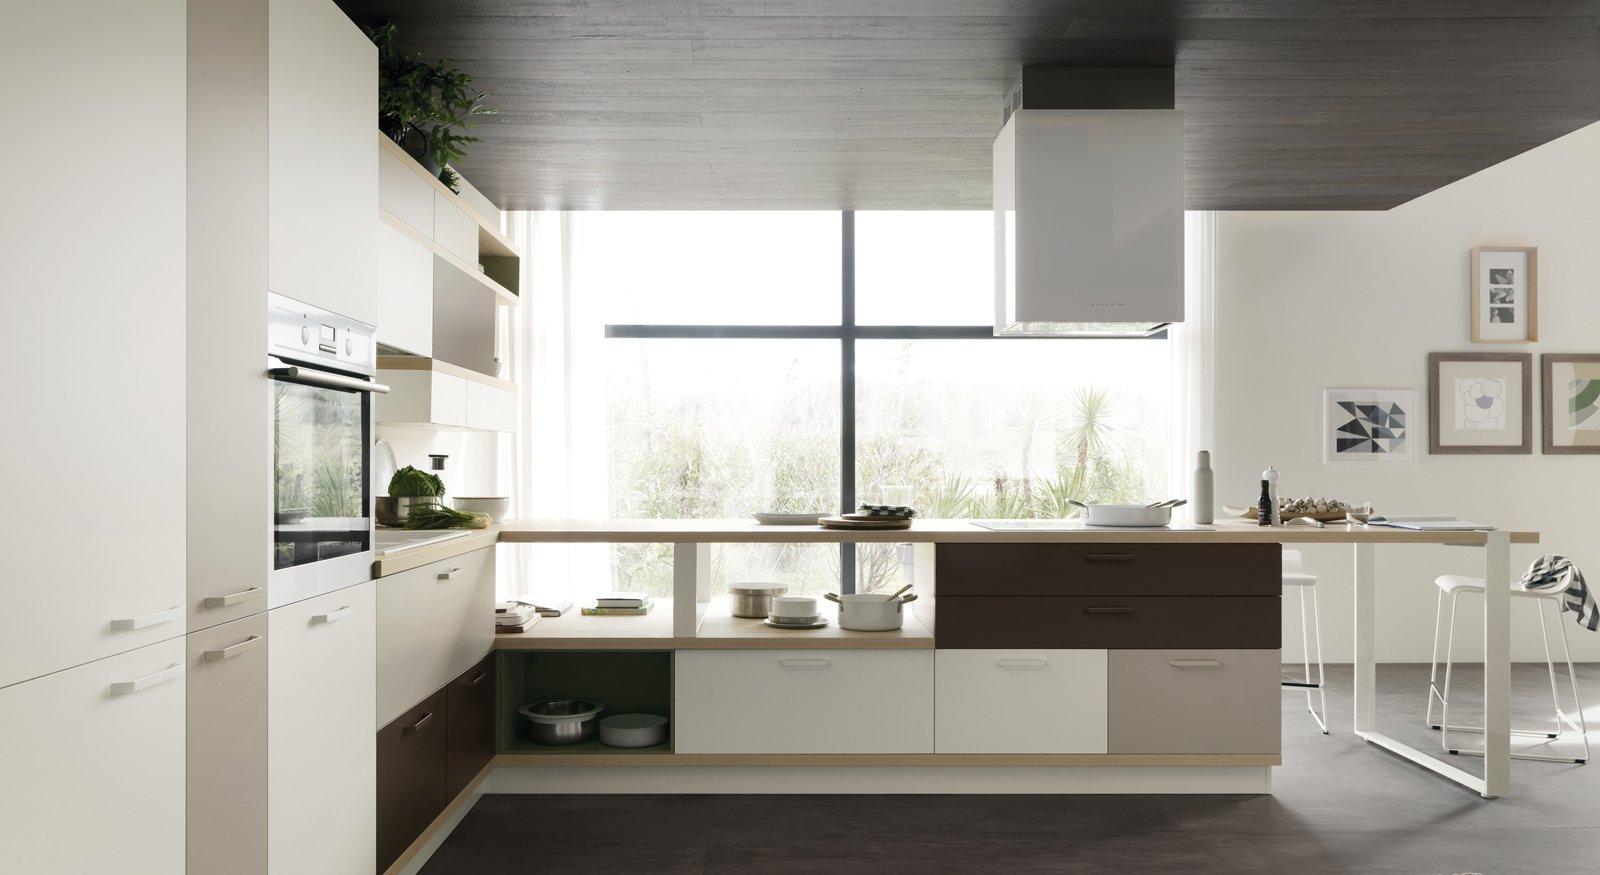 Protagonista Di Foodshelf Di Scavolini è La Penisola In Laminato  #675D4E 1600 875 Immagini Di Cucine In Muratura Moderne